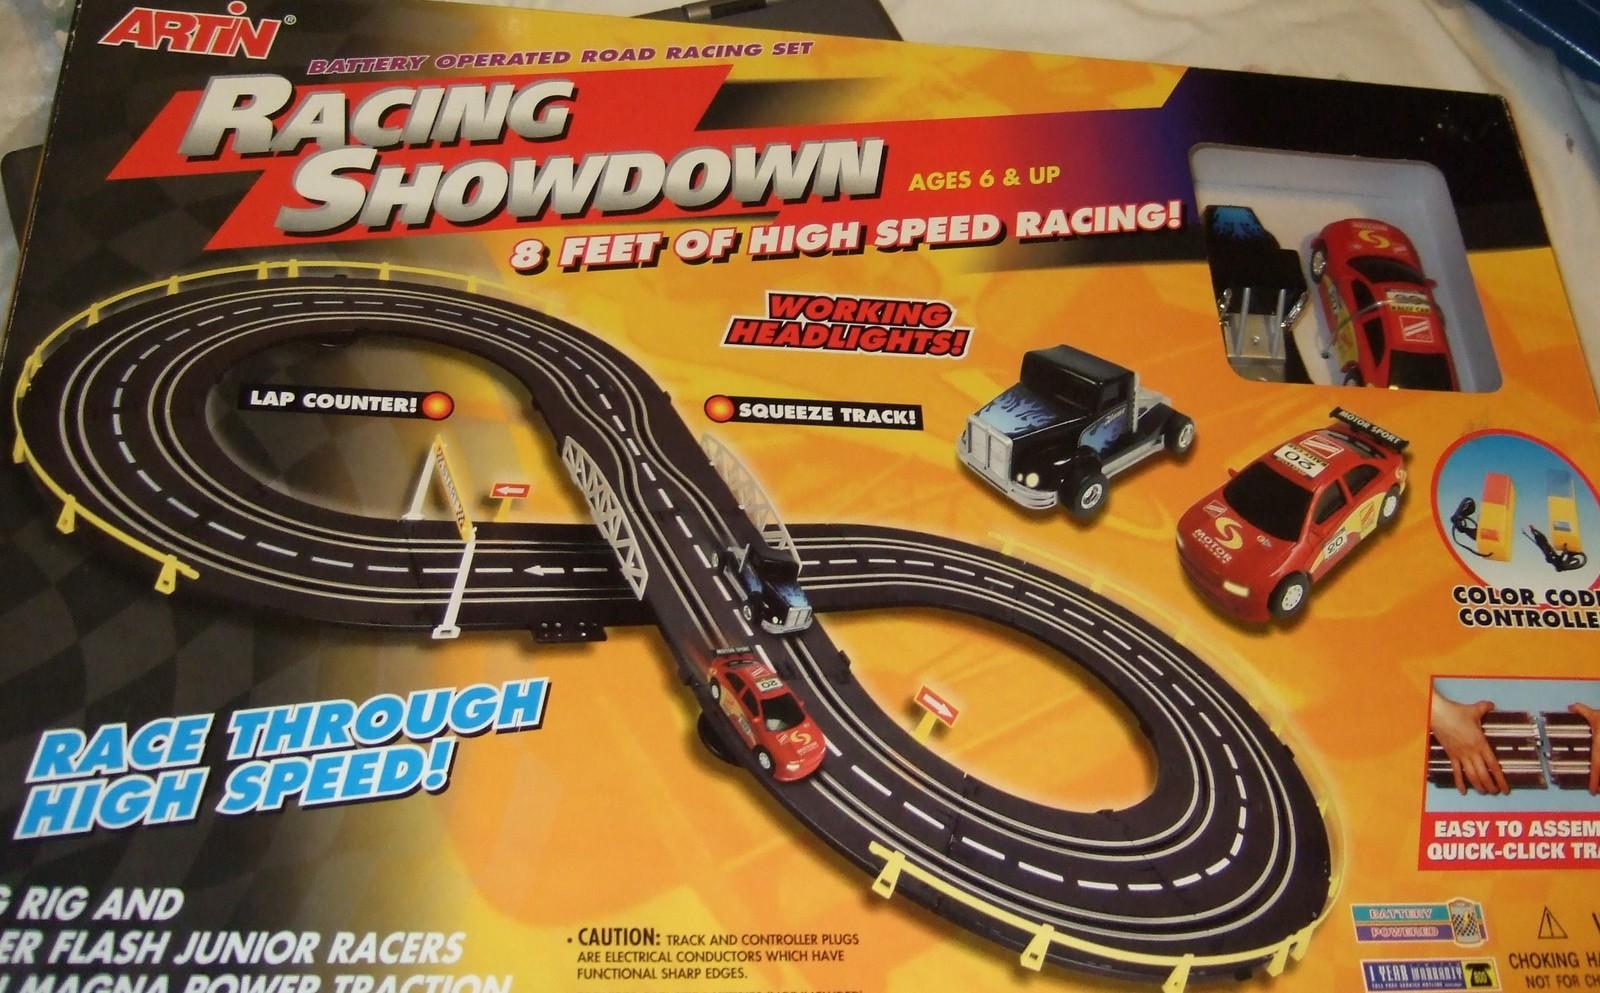 Racing Showdown (Road Racing Set) by Artin- (New)